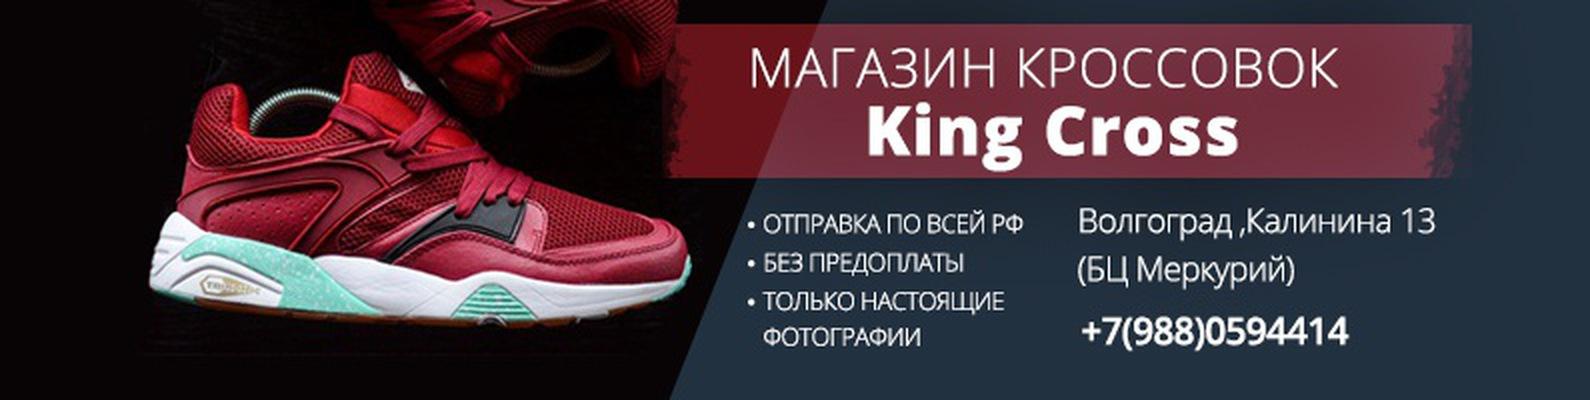 a8723cfc3898 Магазин KingCross - Кроссовки в Волгограде   ВКонтакте